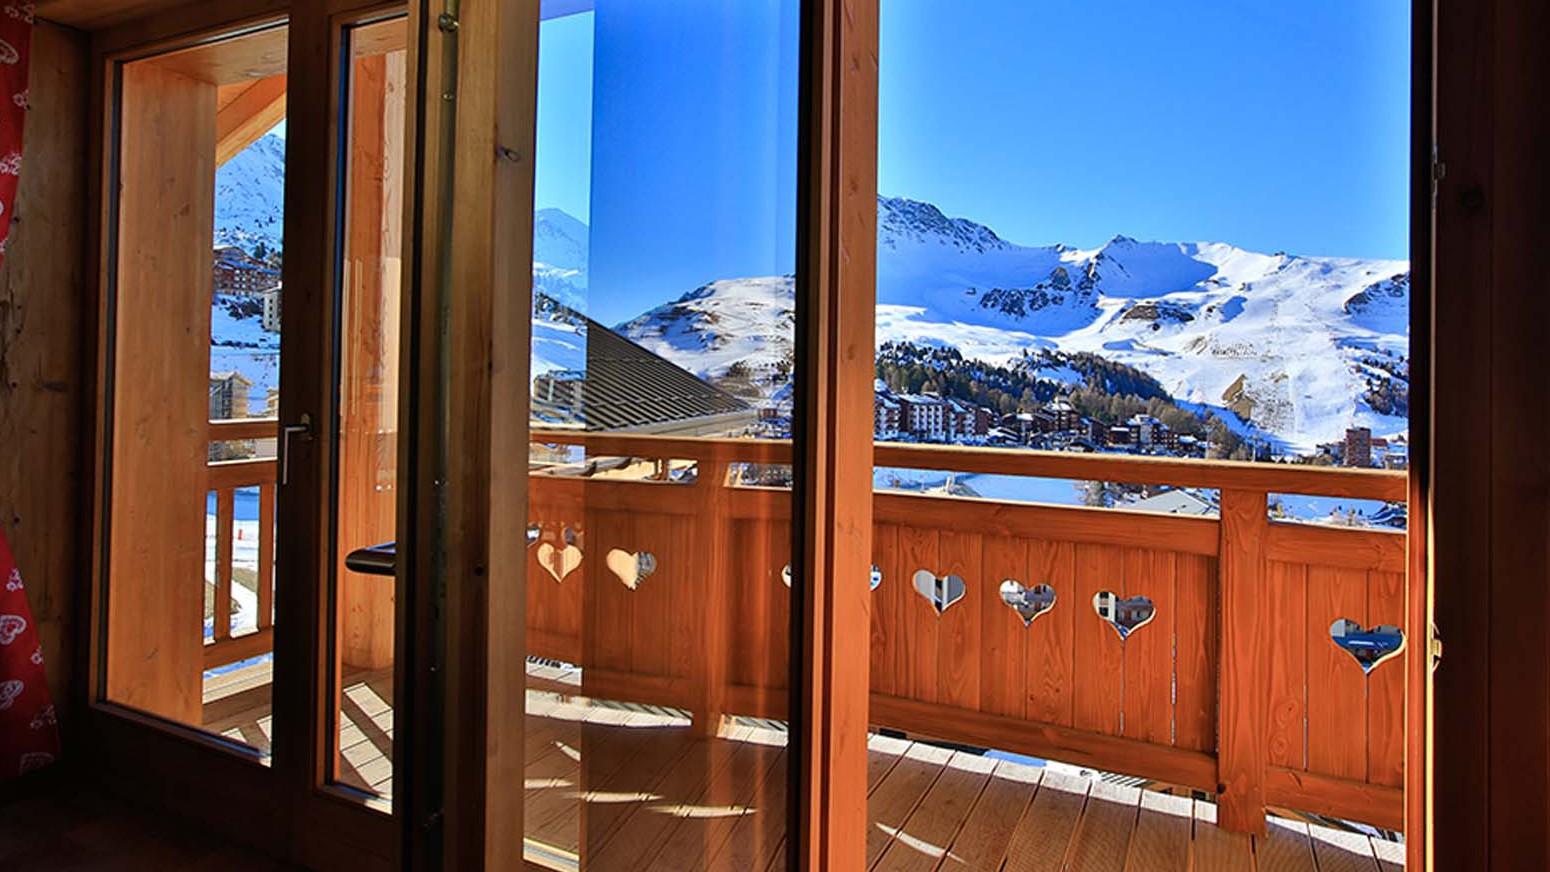 Balcony - Chalet Campanula - Ski Chalet in La Plagne, France